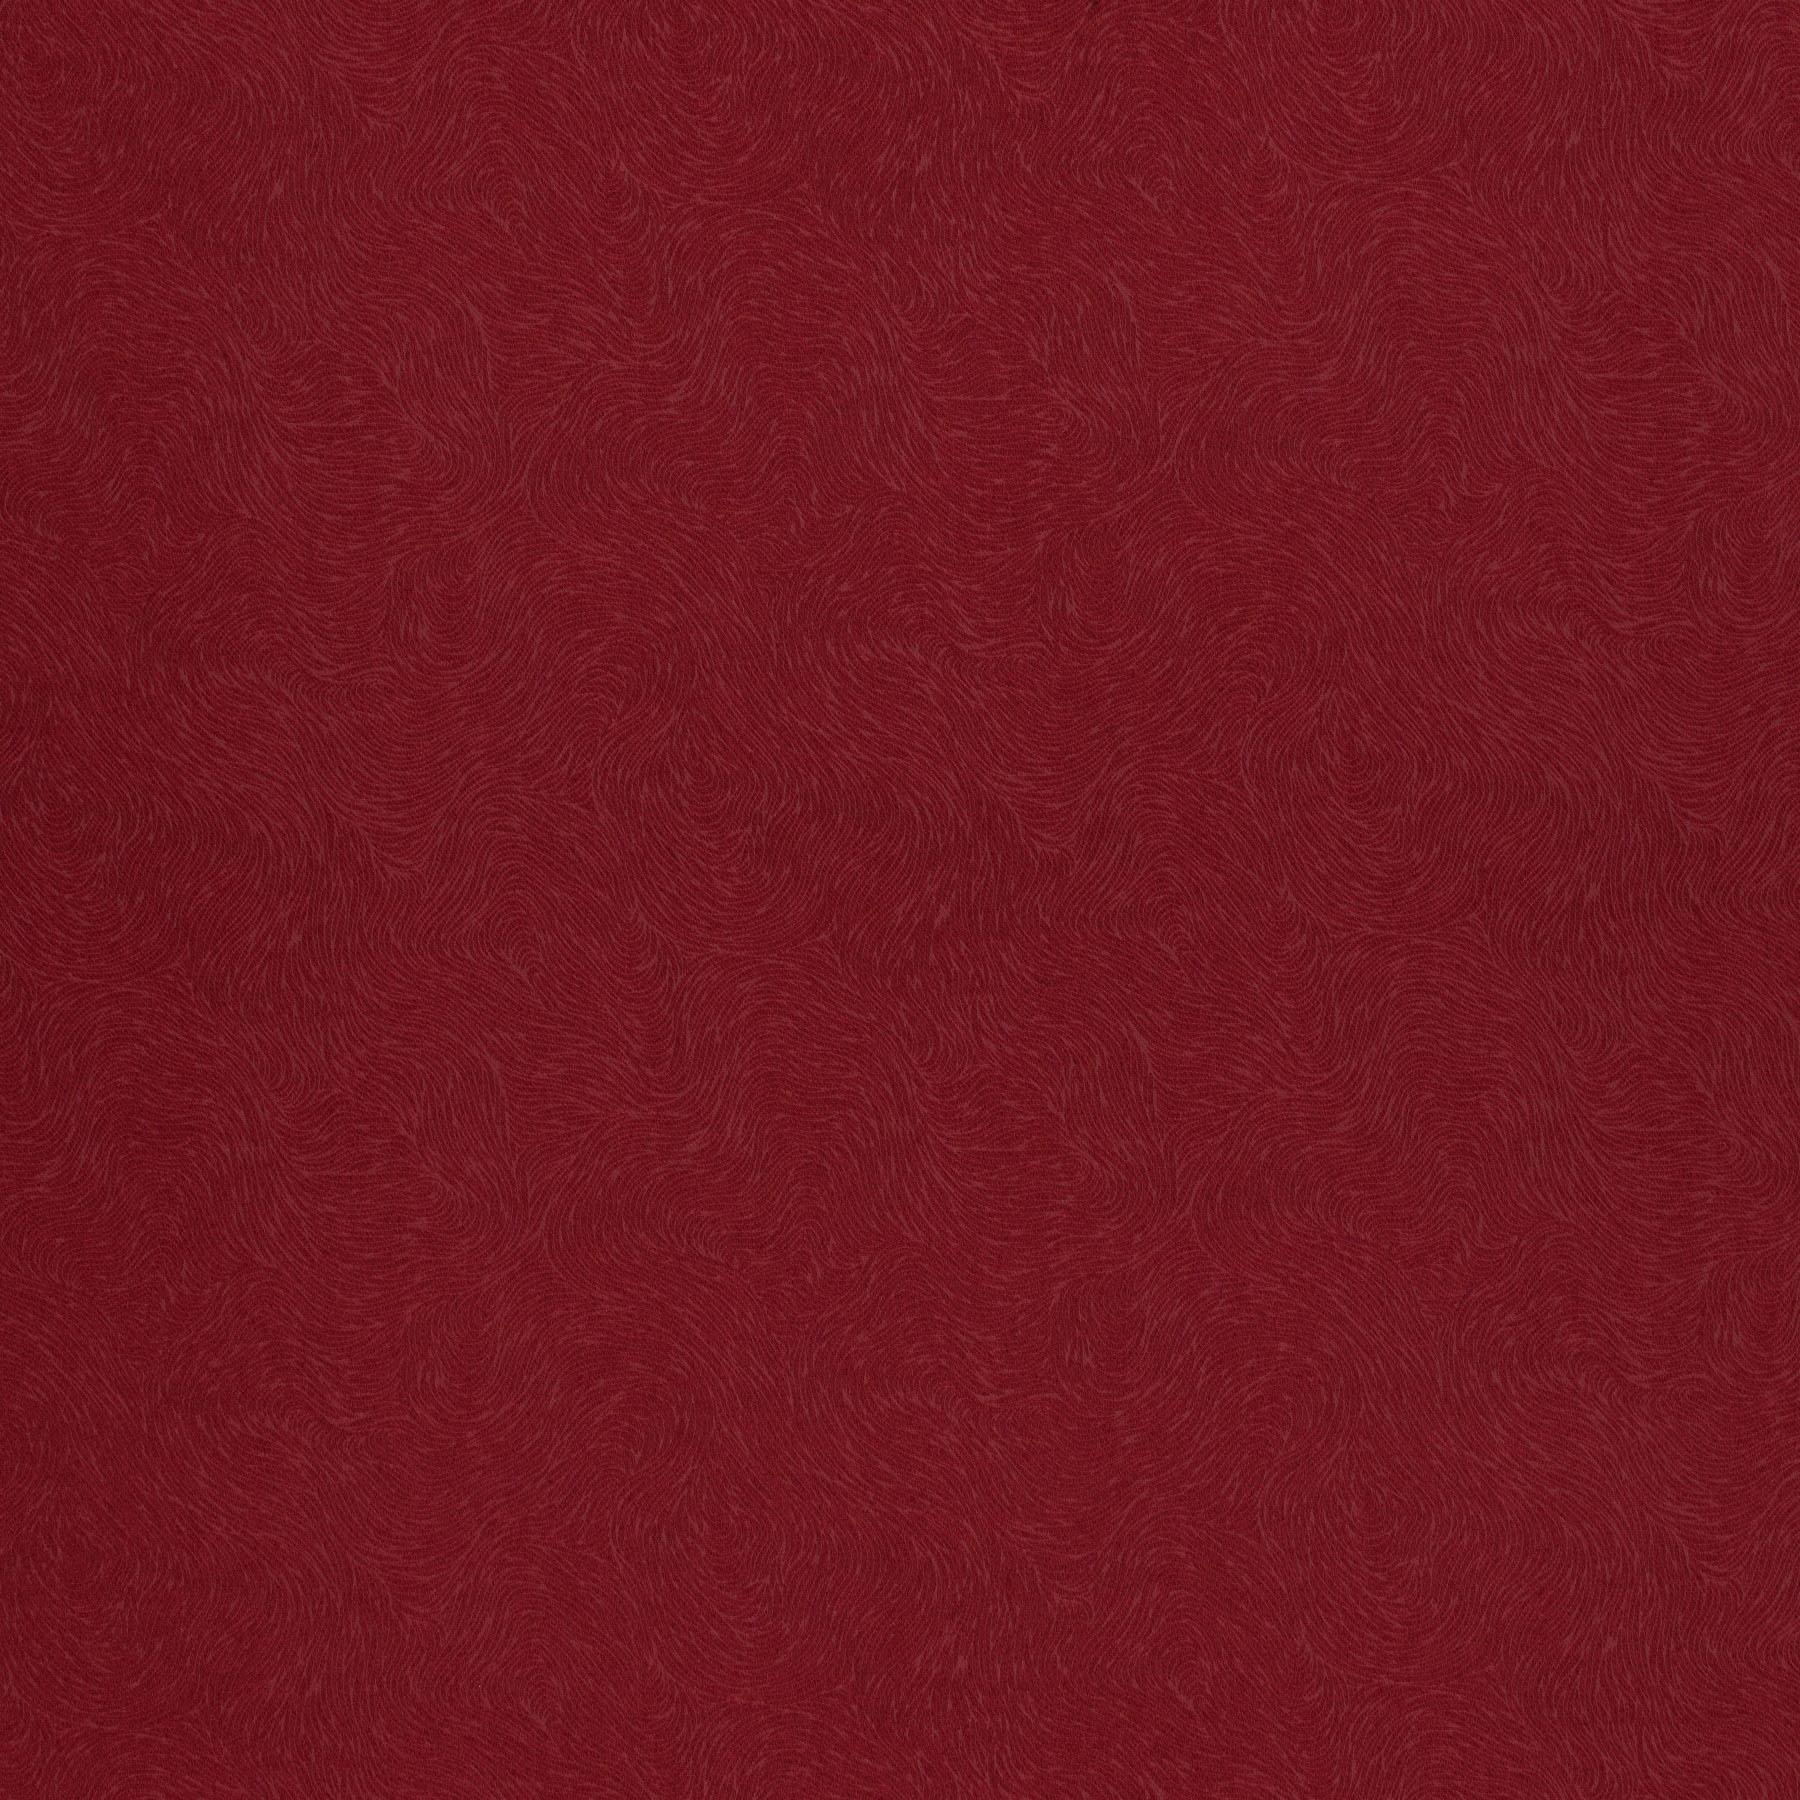 decoration fabric nightlife 1 6708 010 jab anstoetz fabrics. Black Bedroom Furniture Sets. Home Design Ideas